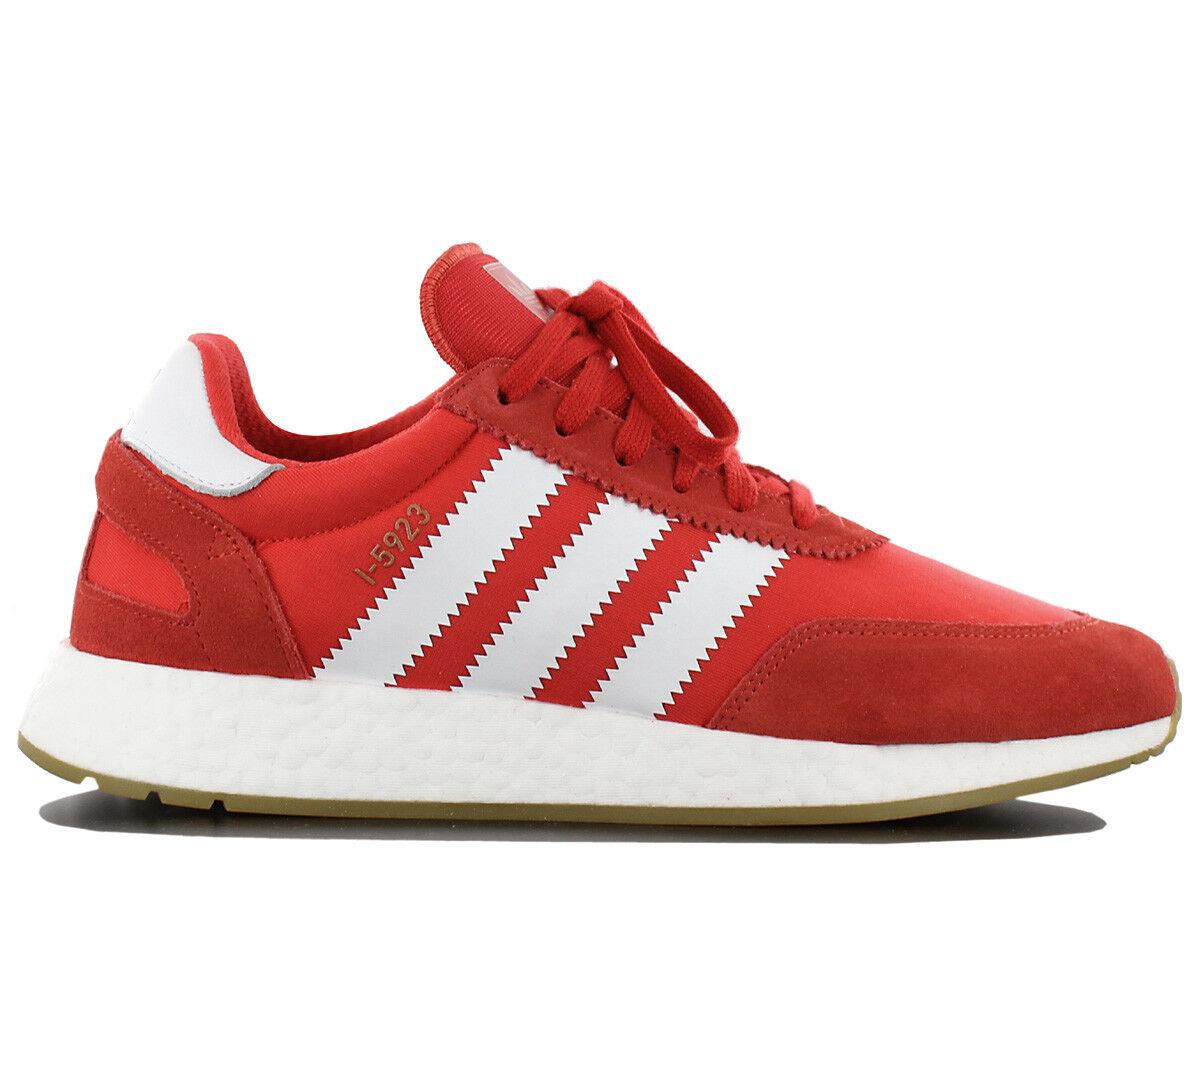 baskets adidas iniki iniki adidas i-5923 stimuler les hommes bb2091 chaussures tennis rouges de loisirs a16f71